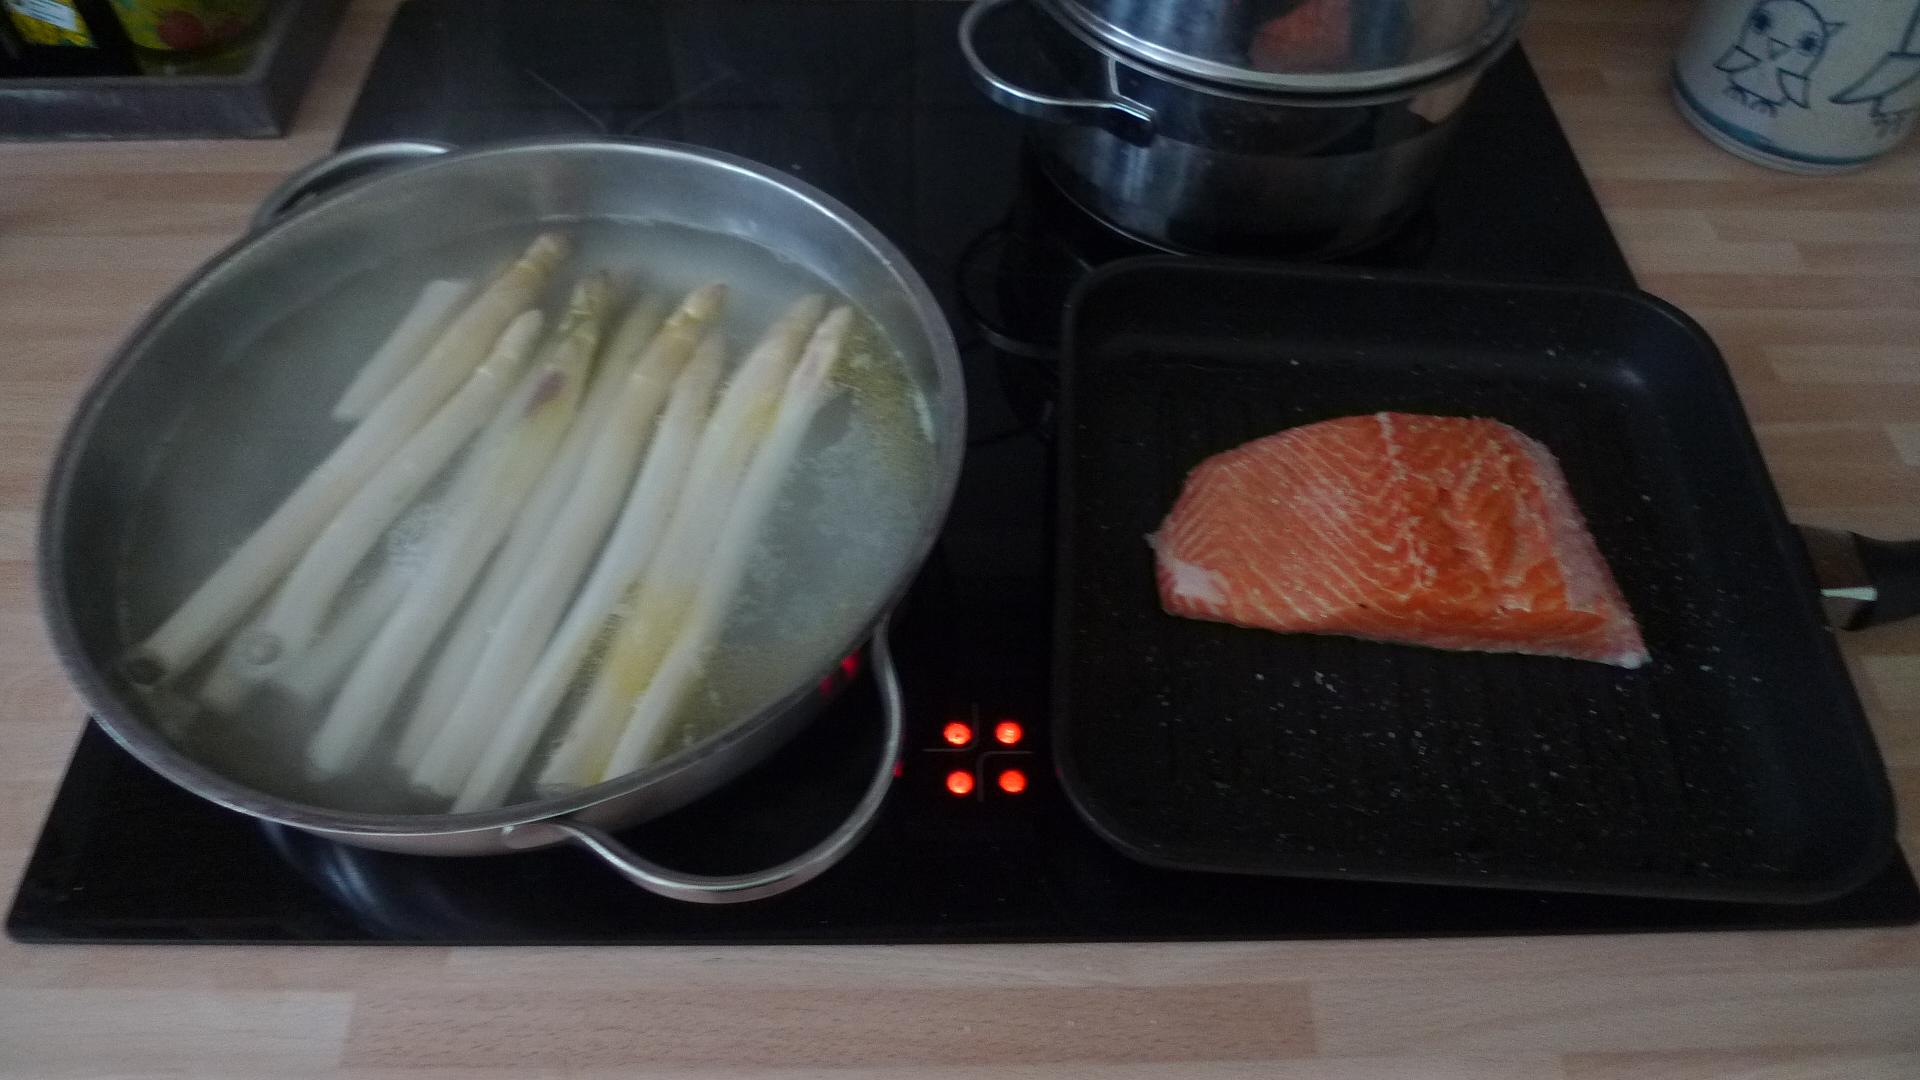 Lachs,Spargel,Salat,Kartoffeln - 25.4.15   (2)